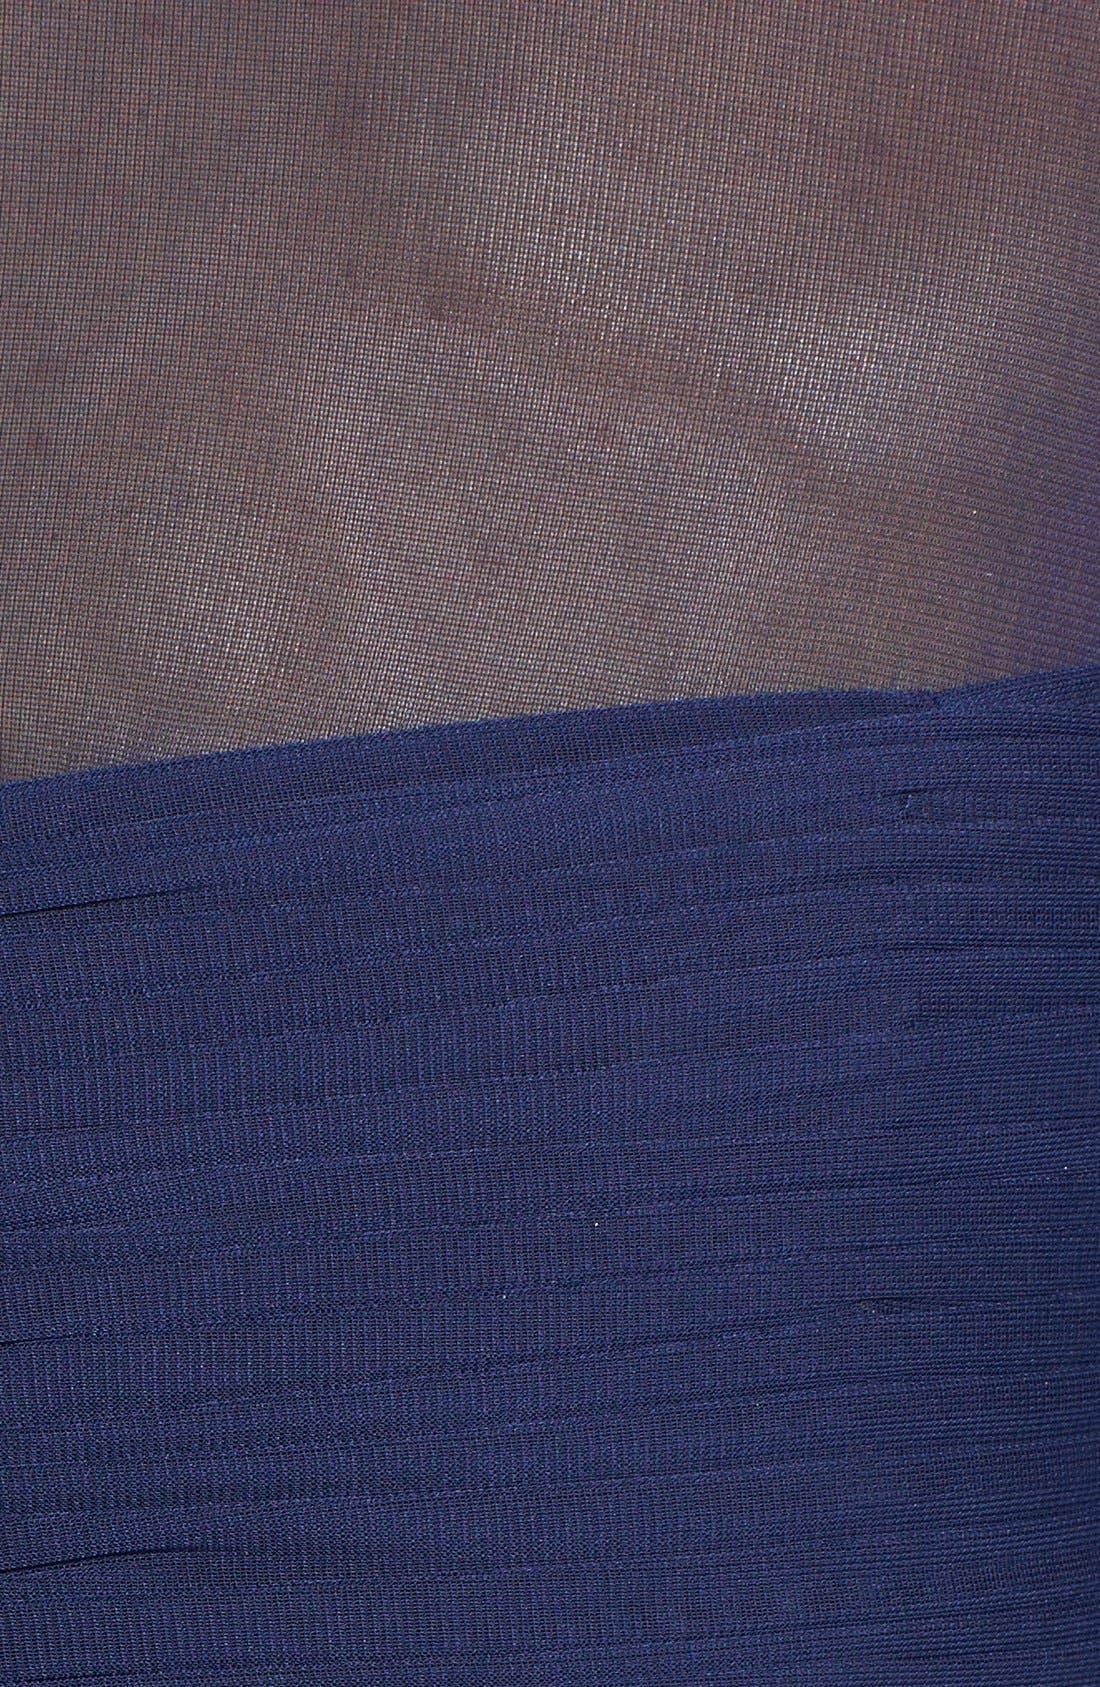 Alternate Image 4  - Alex Evenings Embellished Illusion Yoke Chiffon Fit & Flare Dress (Regular & Petite)